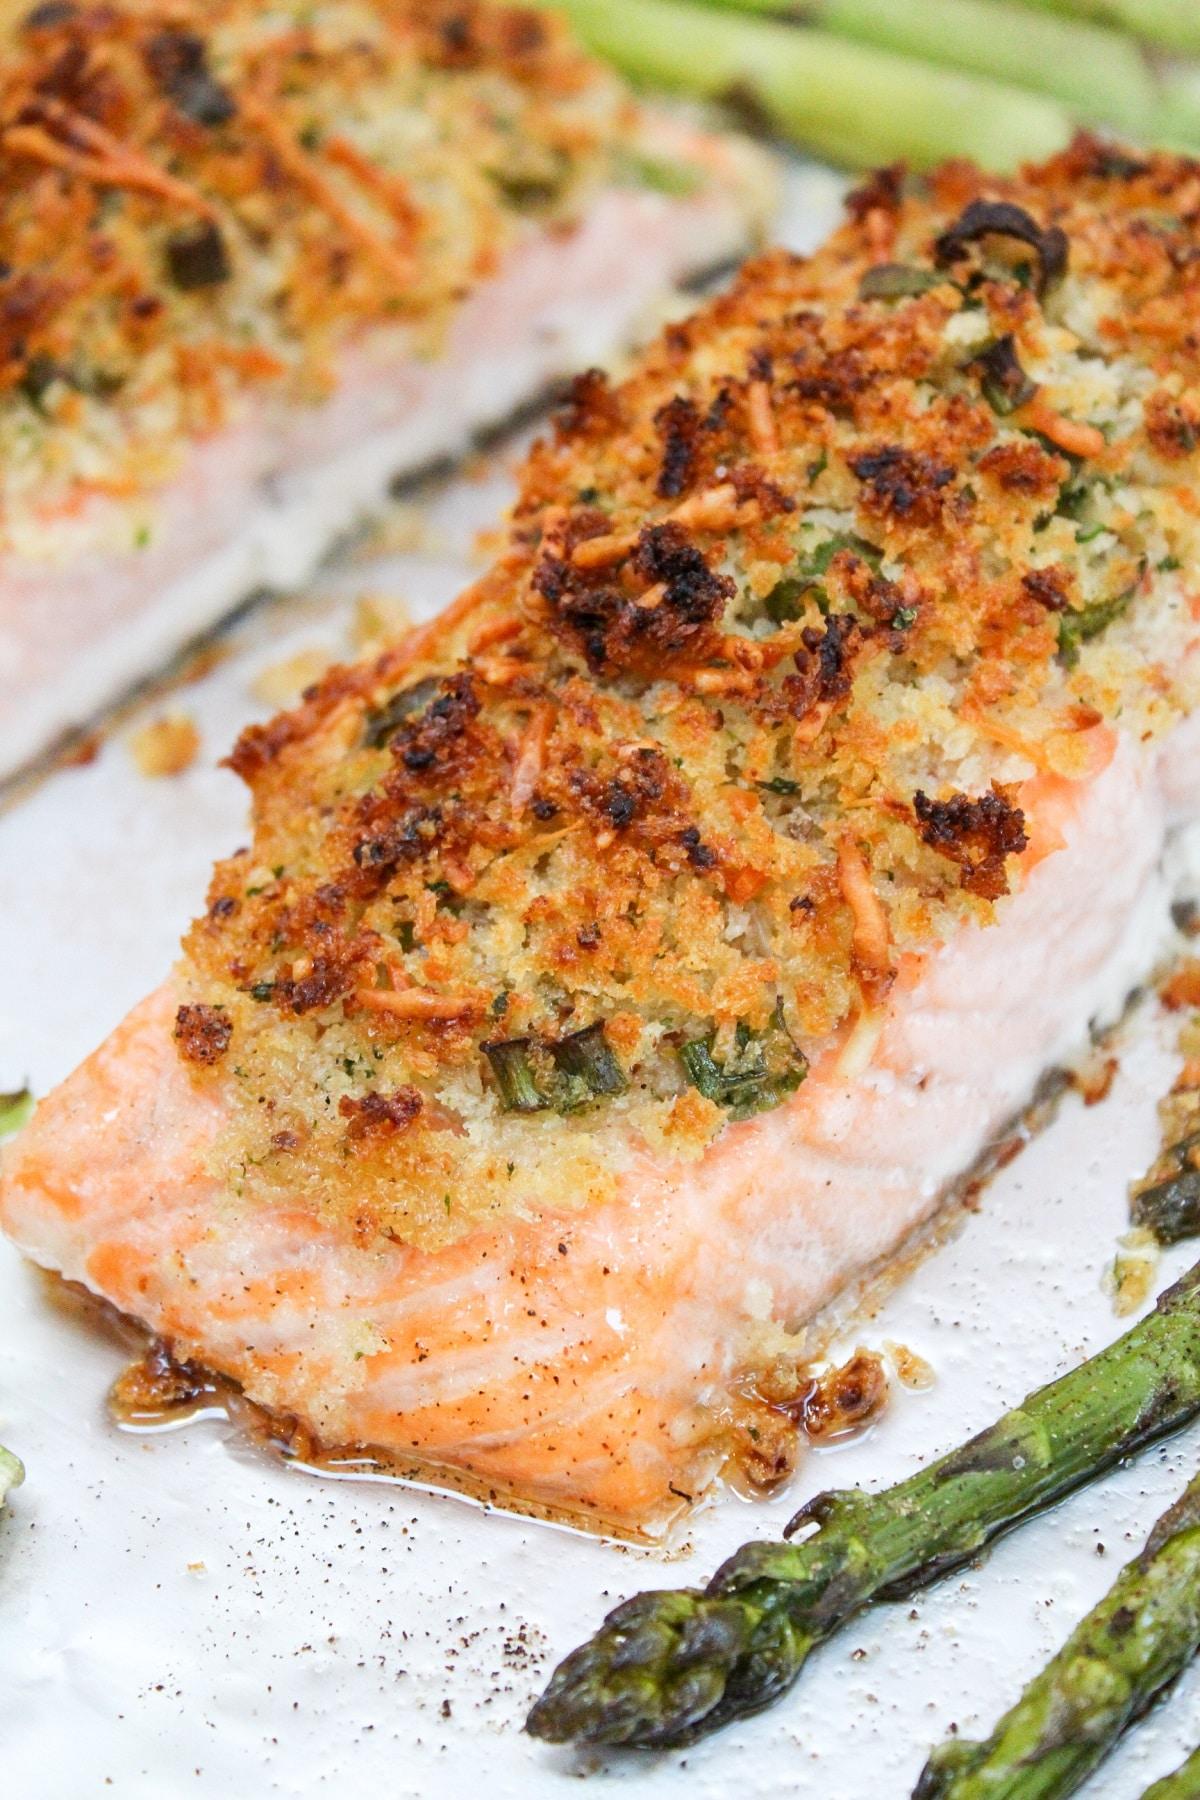 plated crispy sheet pan salmon with asparagus